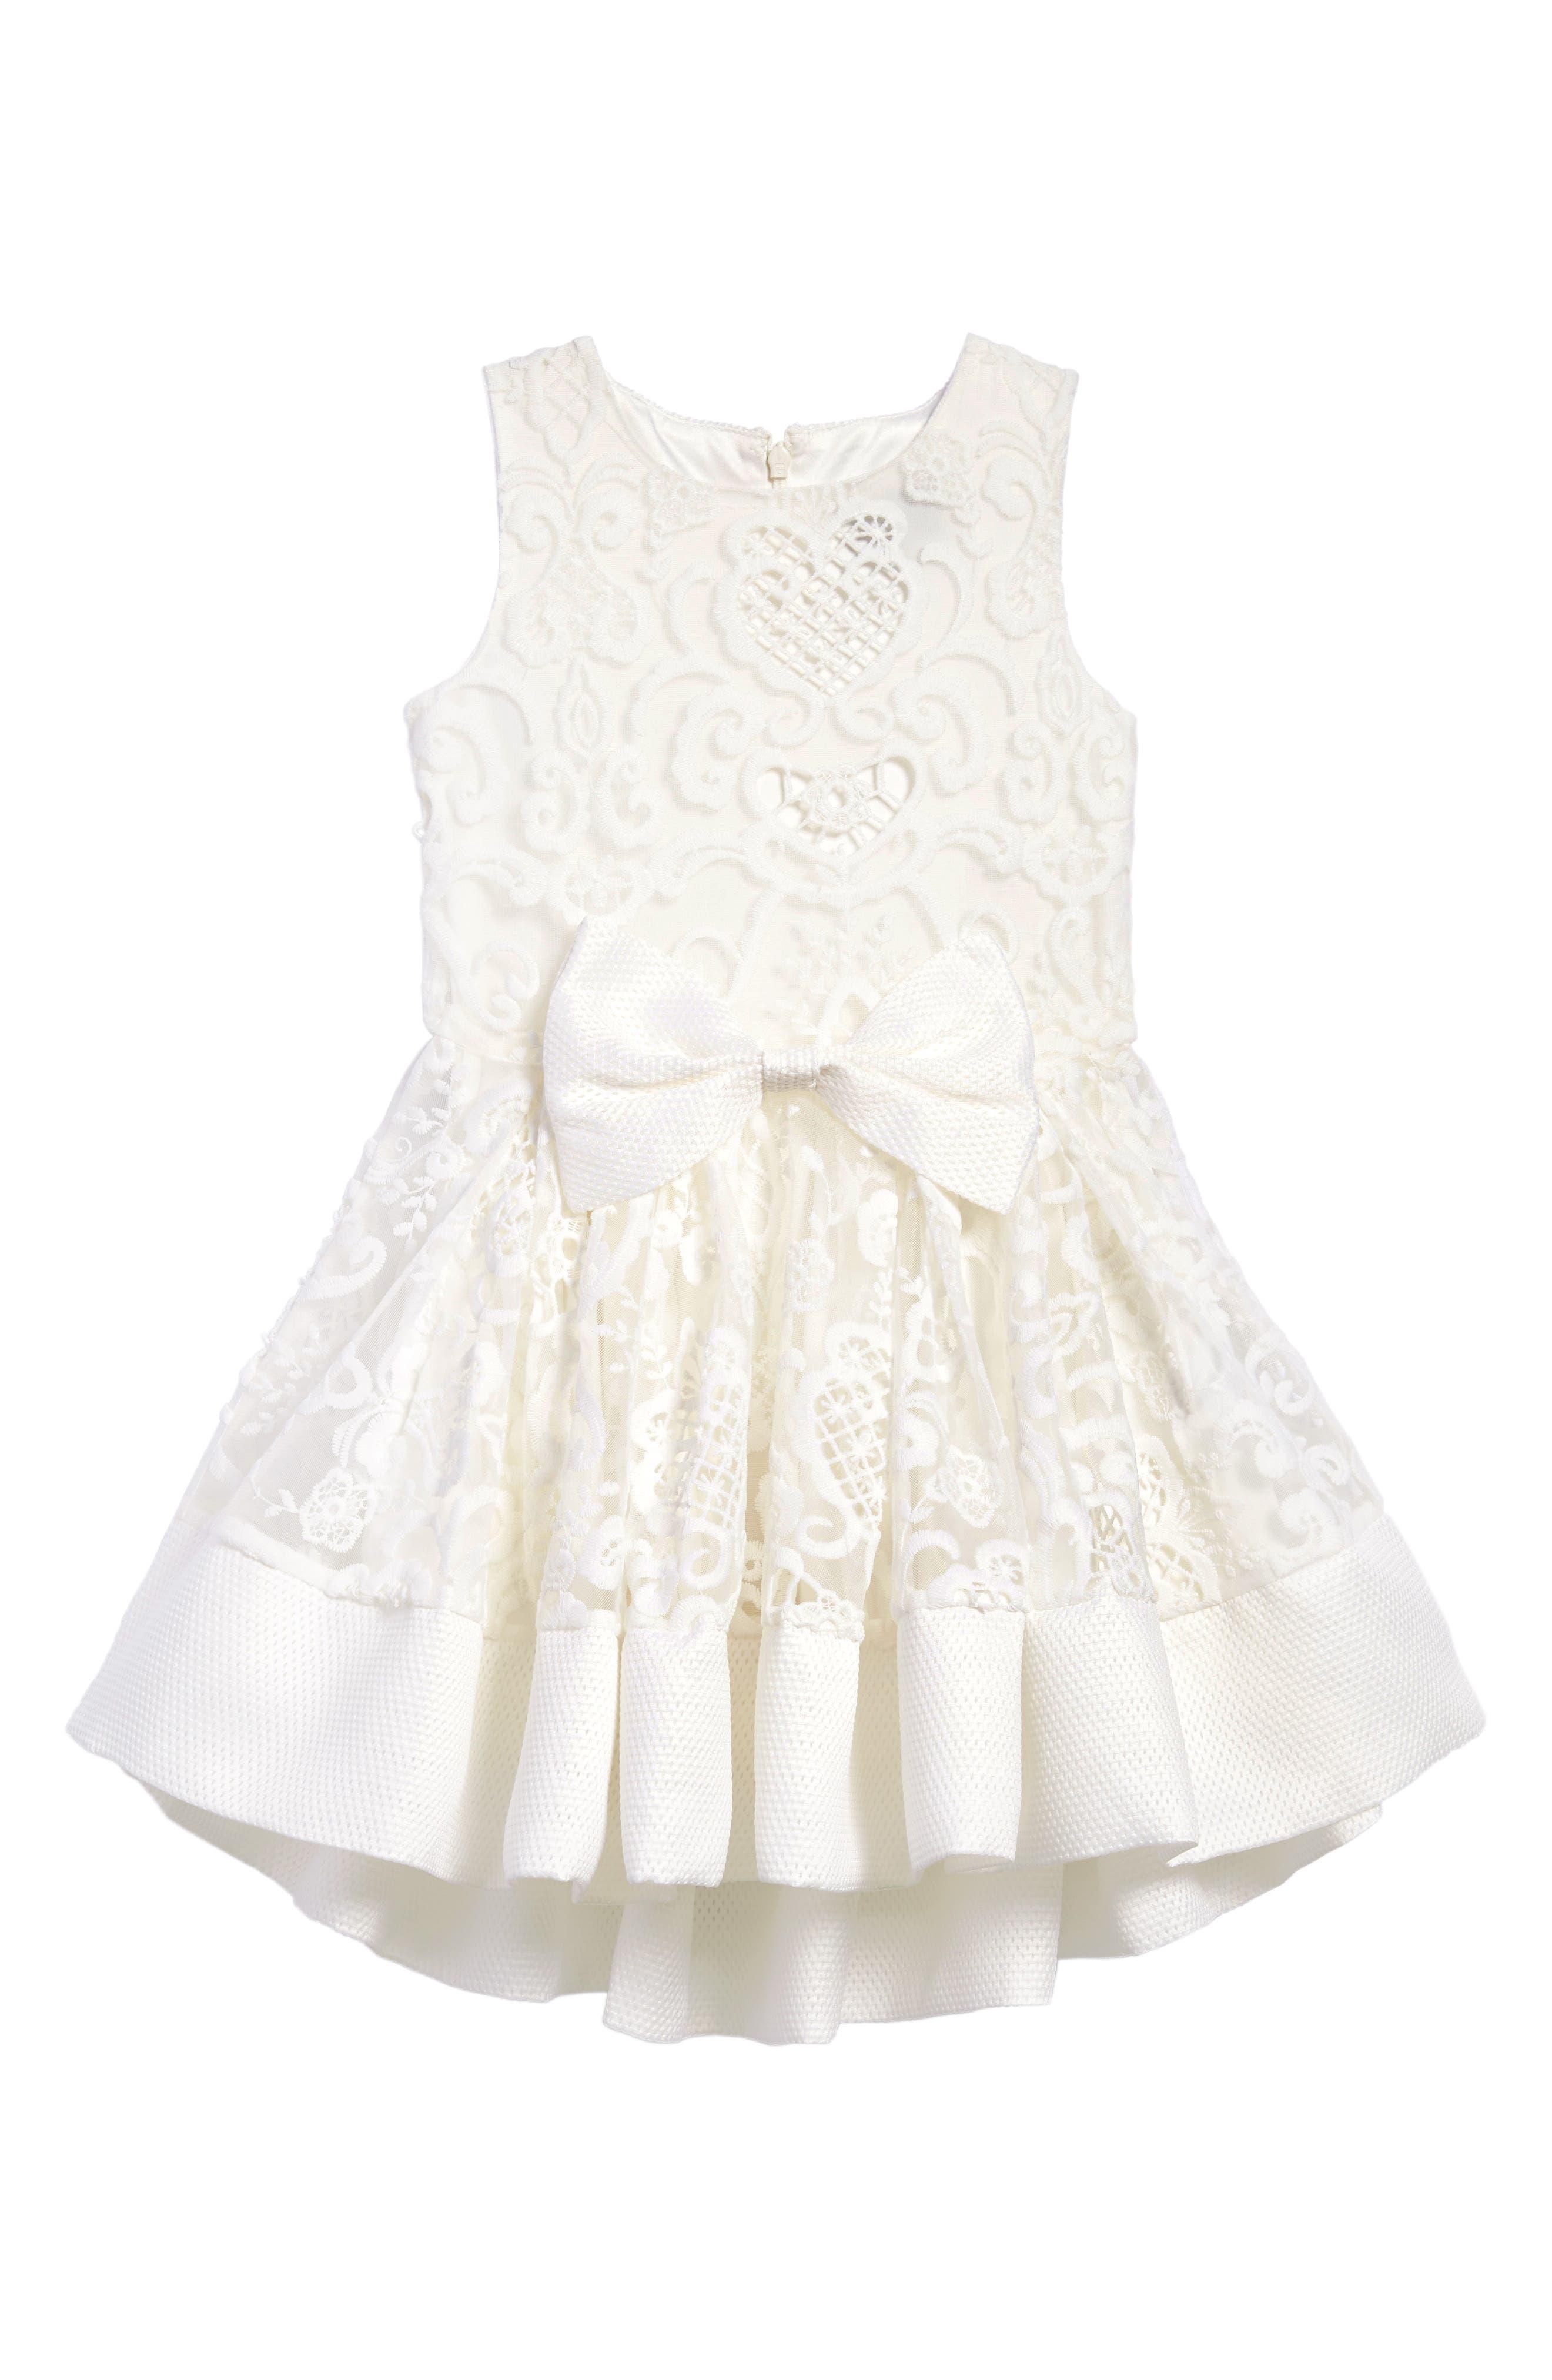 Ava Starlet Dress,                         Main,                         color, 907